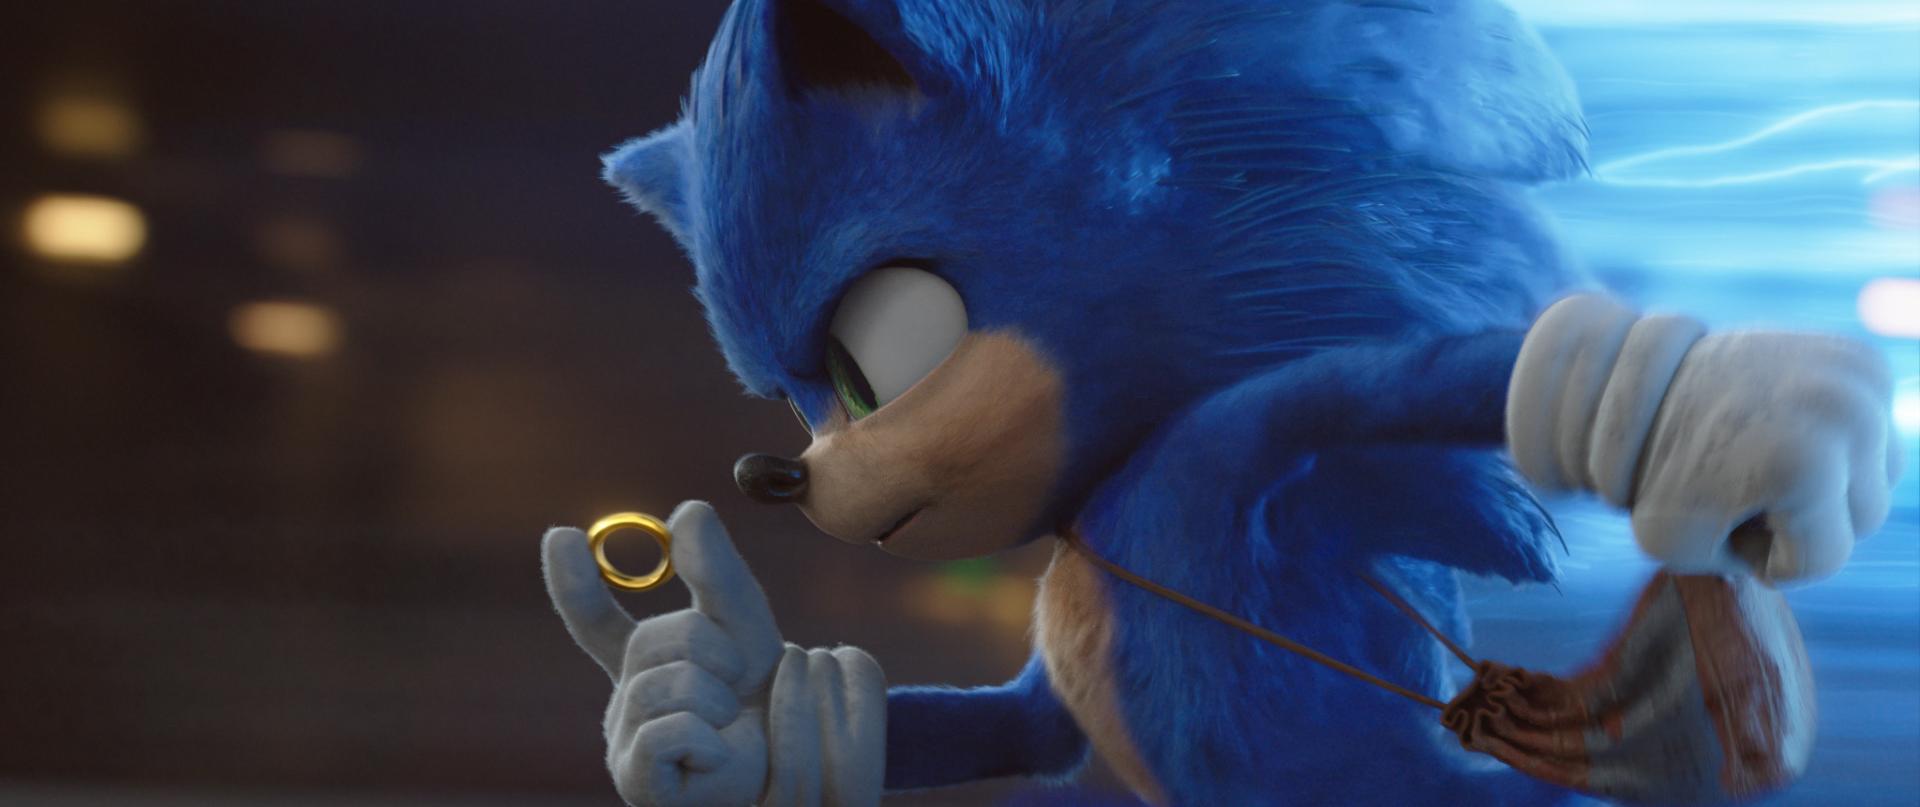 Jim Carries Sonic The Hedgehog Movie The Emory Wheel